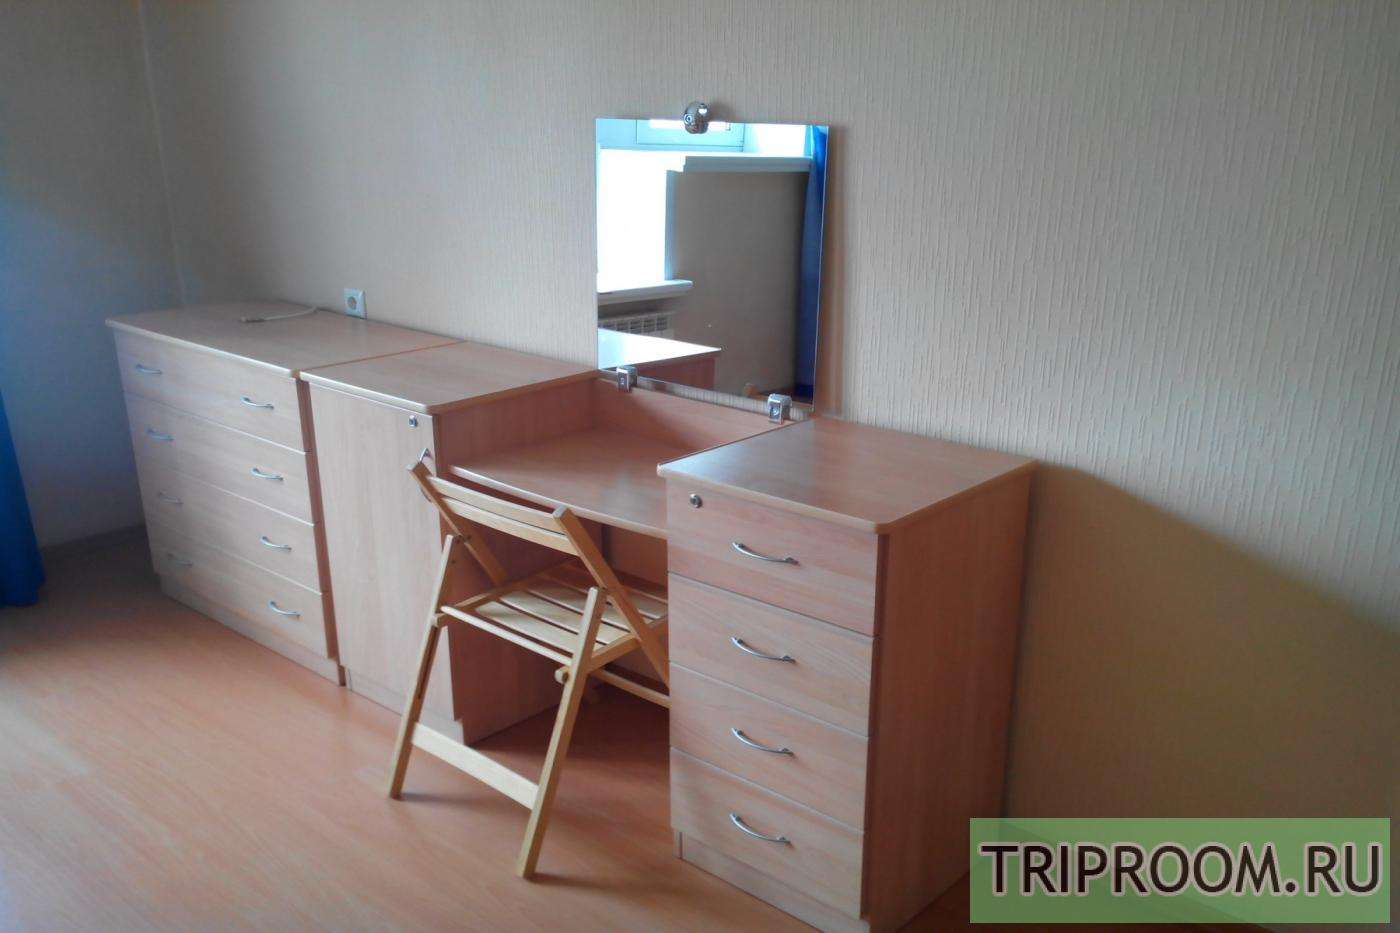 2-комнатная квартира посуточно (вариант № 10044), ул. Ломоносова улица, фото № 13